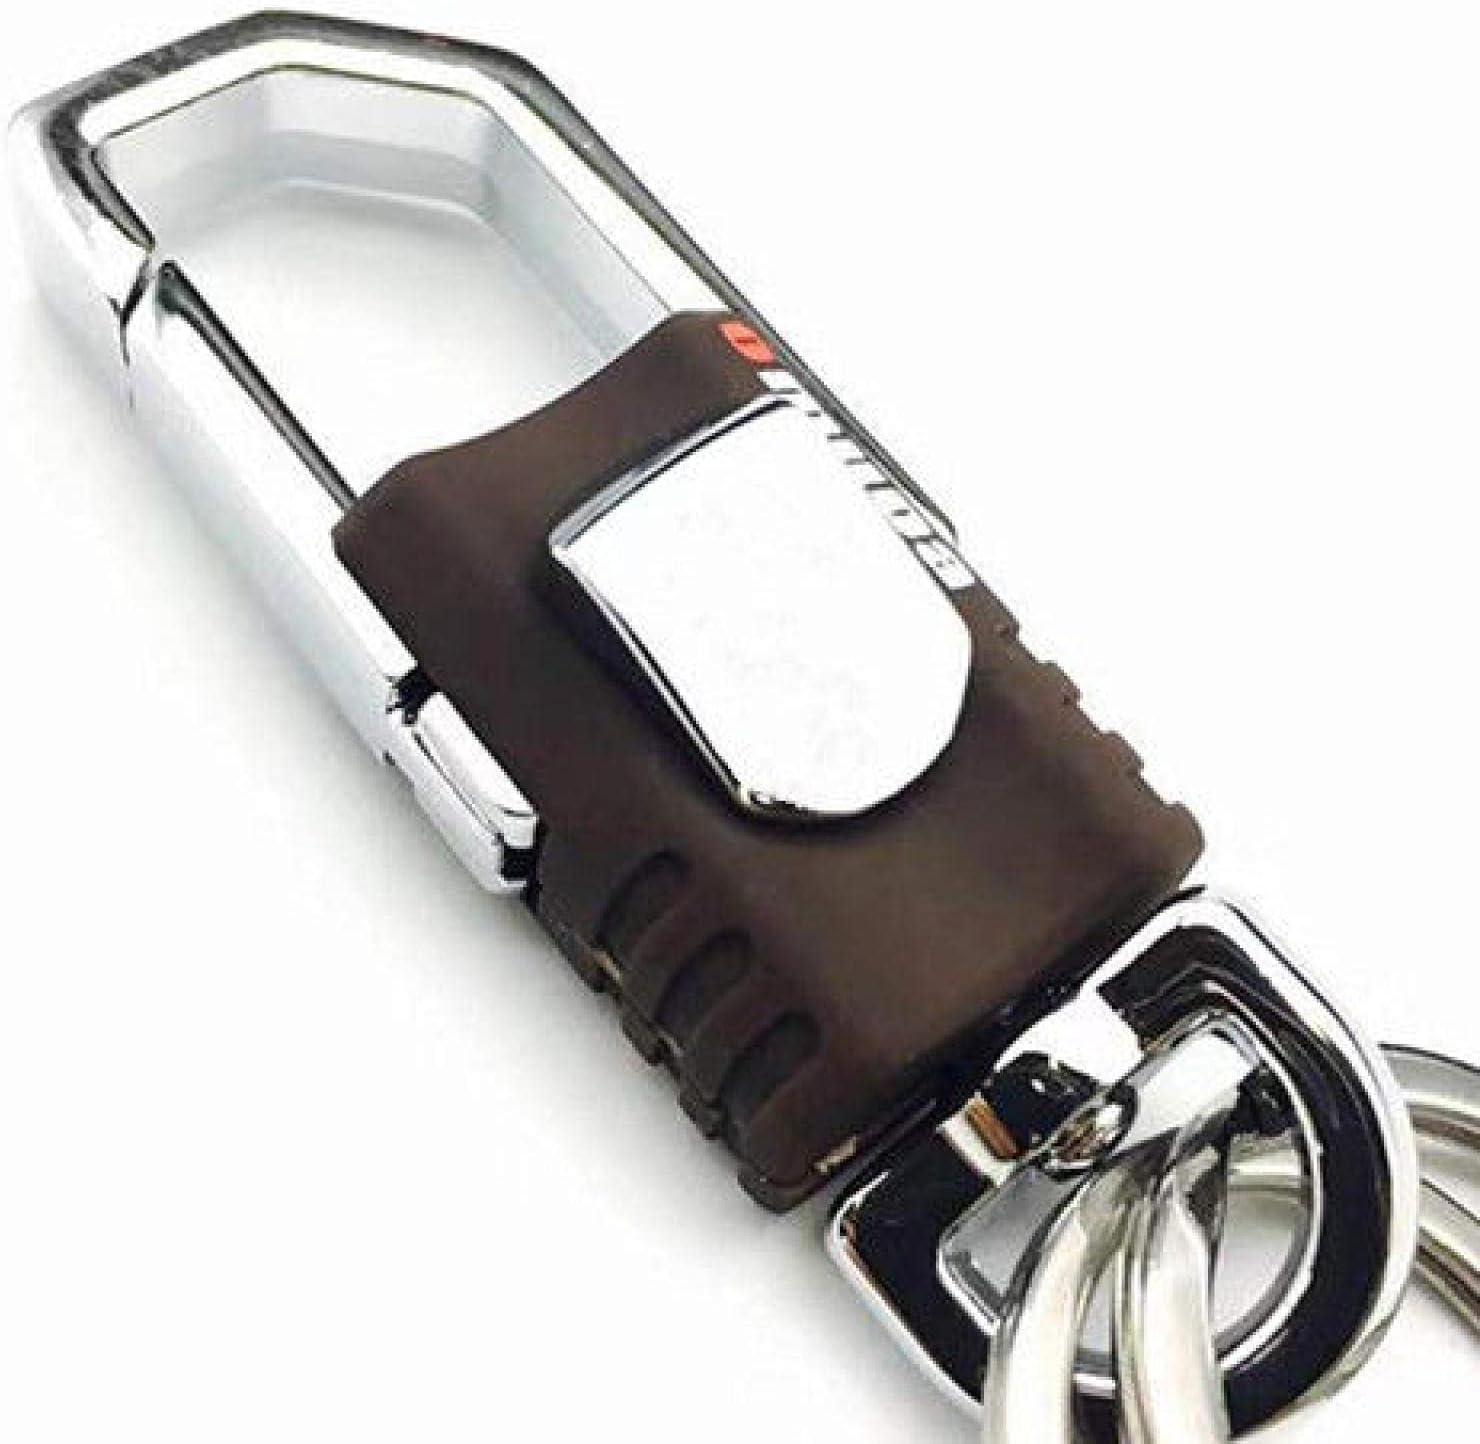 SZLGPJ Los Angeles Mall Keychain Pendant Men and Women Key free car Alloy Chain Couple